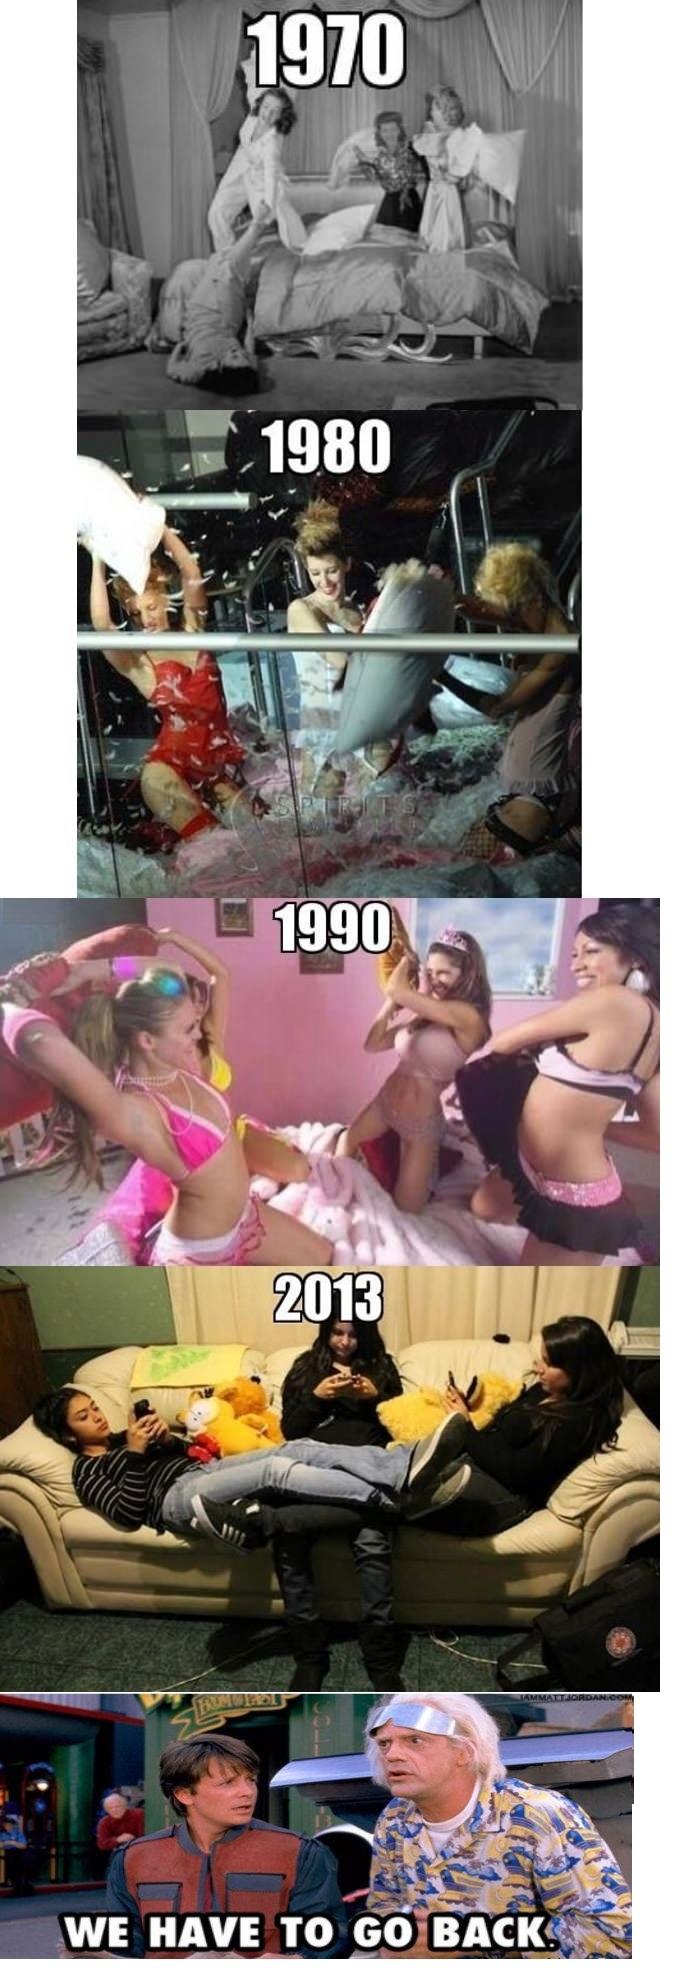 Mesdames il faut reprendre les bonnes vieilles traditions...hihi